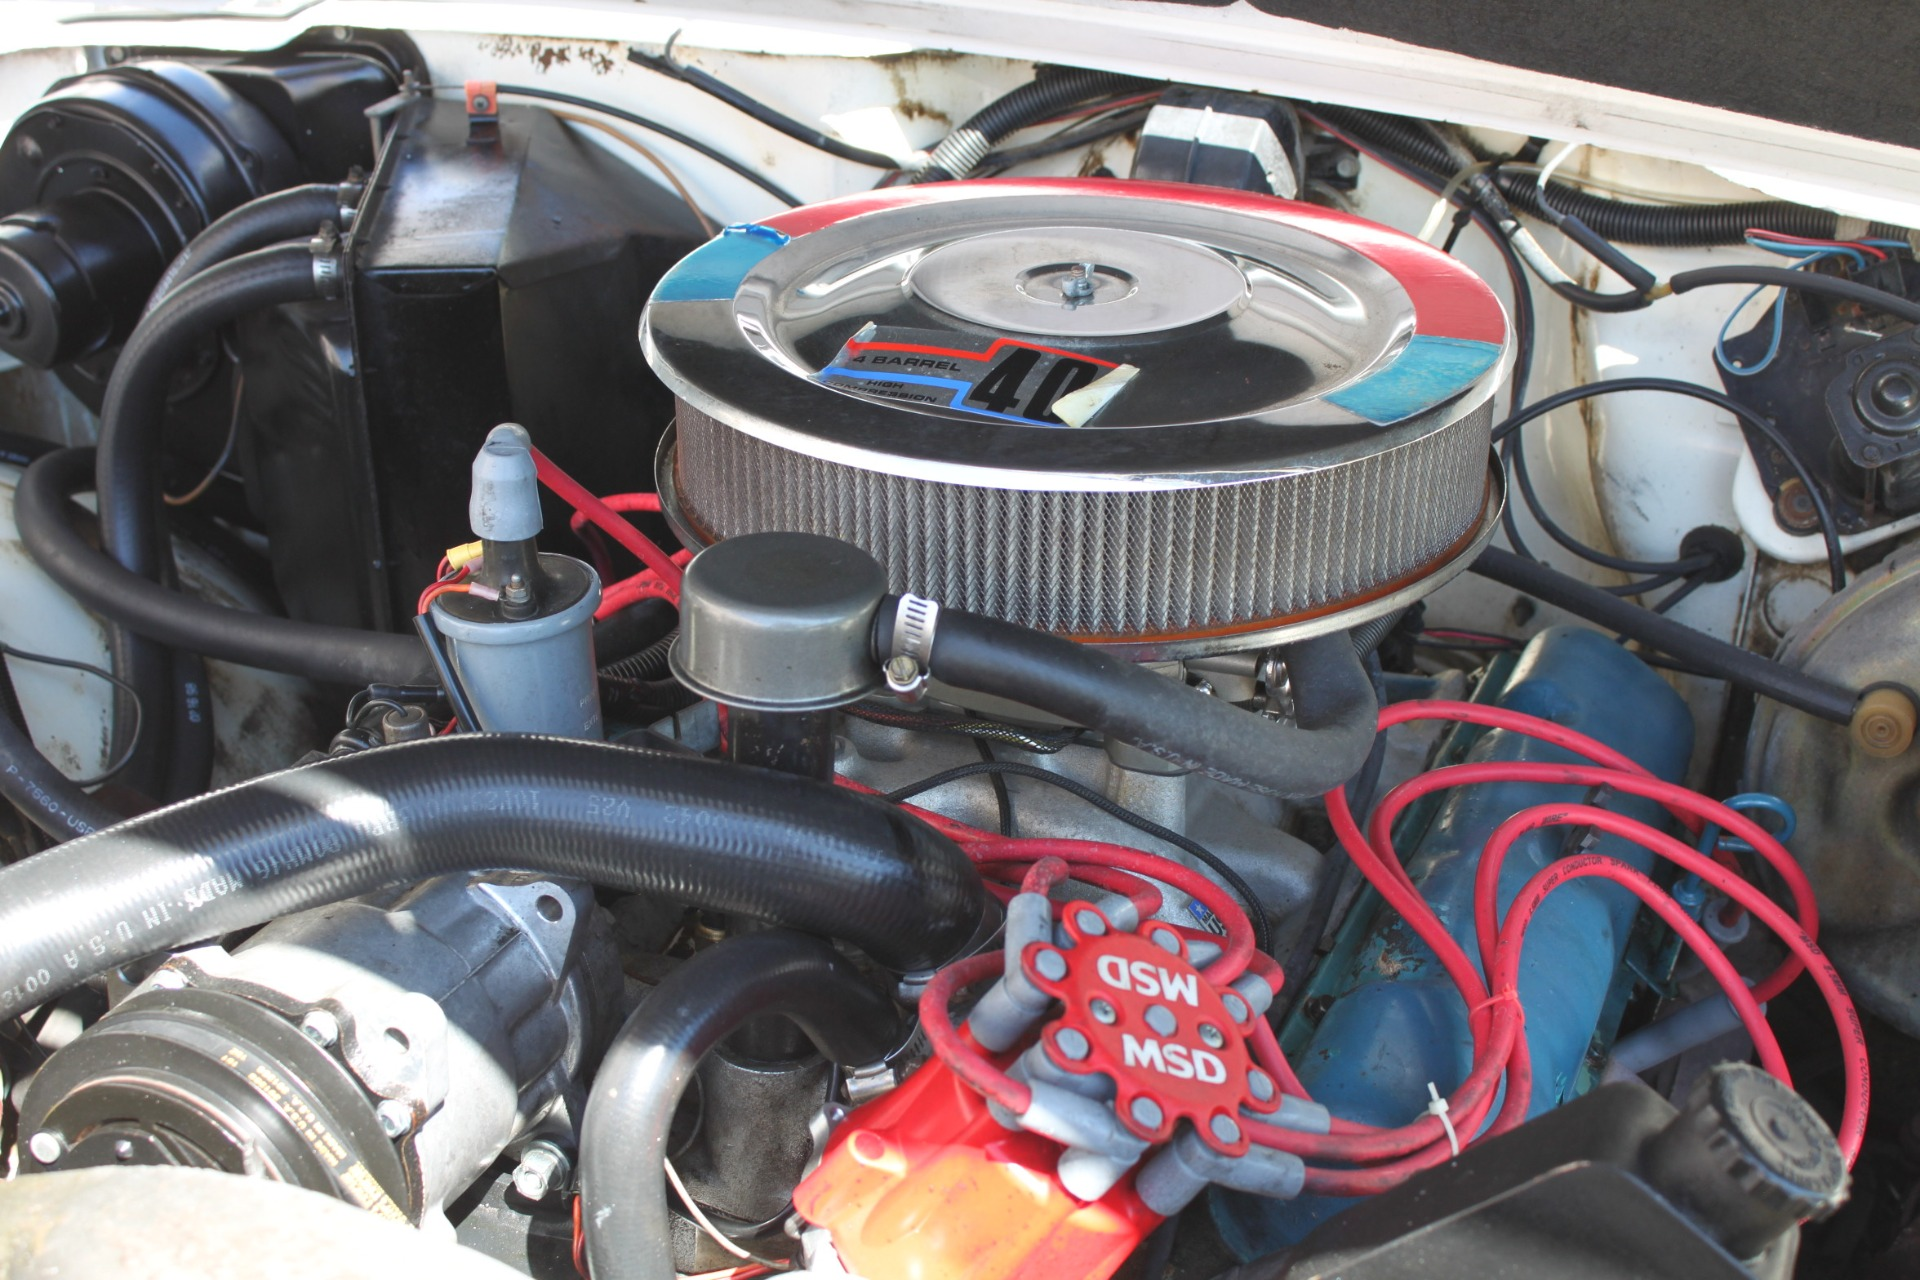 Used-1977-Jeep-Wagoneer-Custom-Fuel-Injected-66-Liter-401-Land-Cruiser